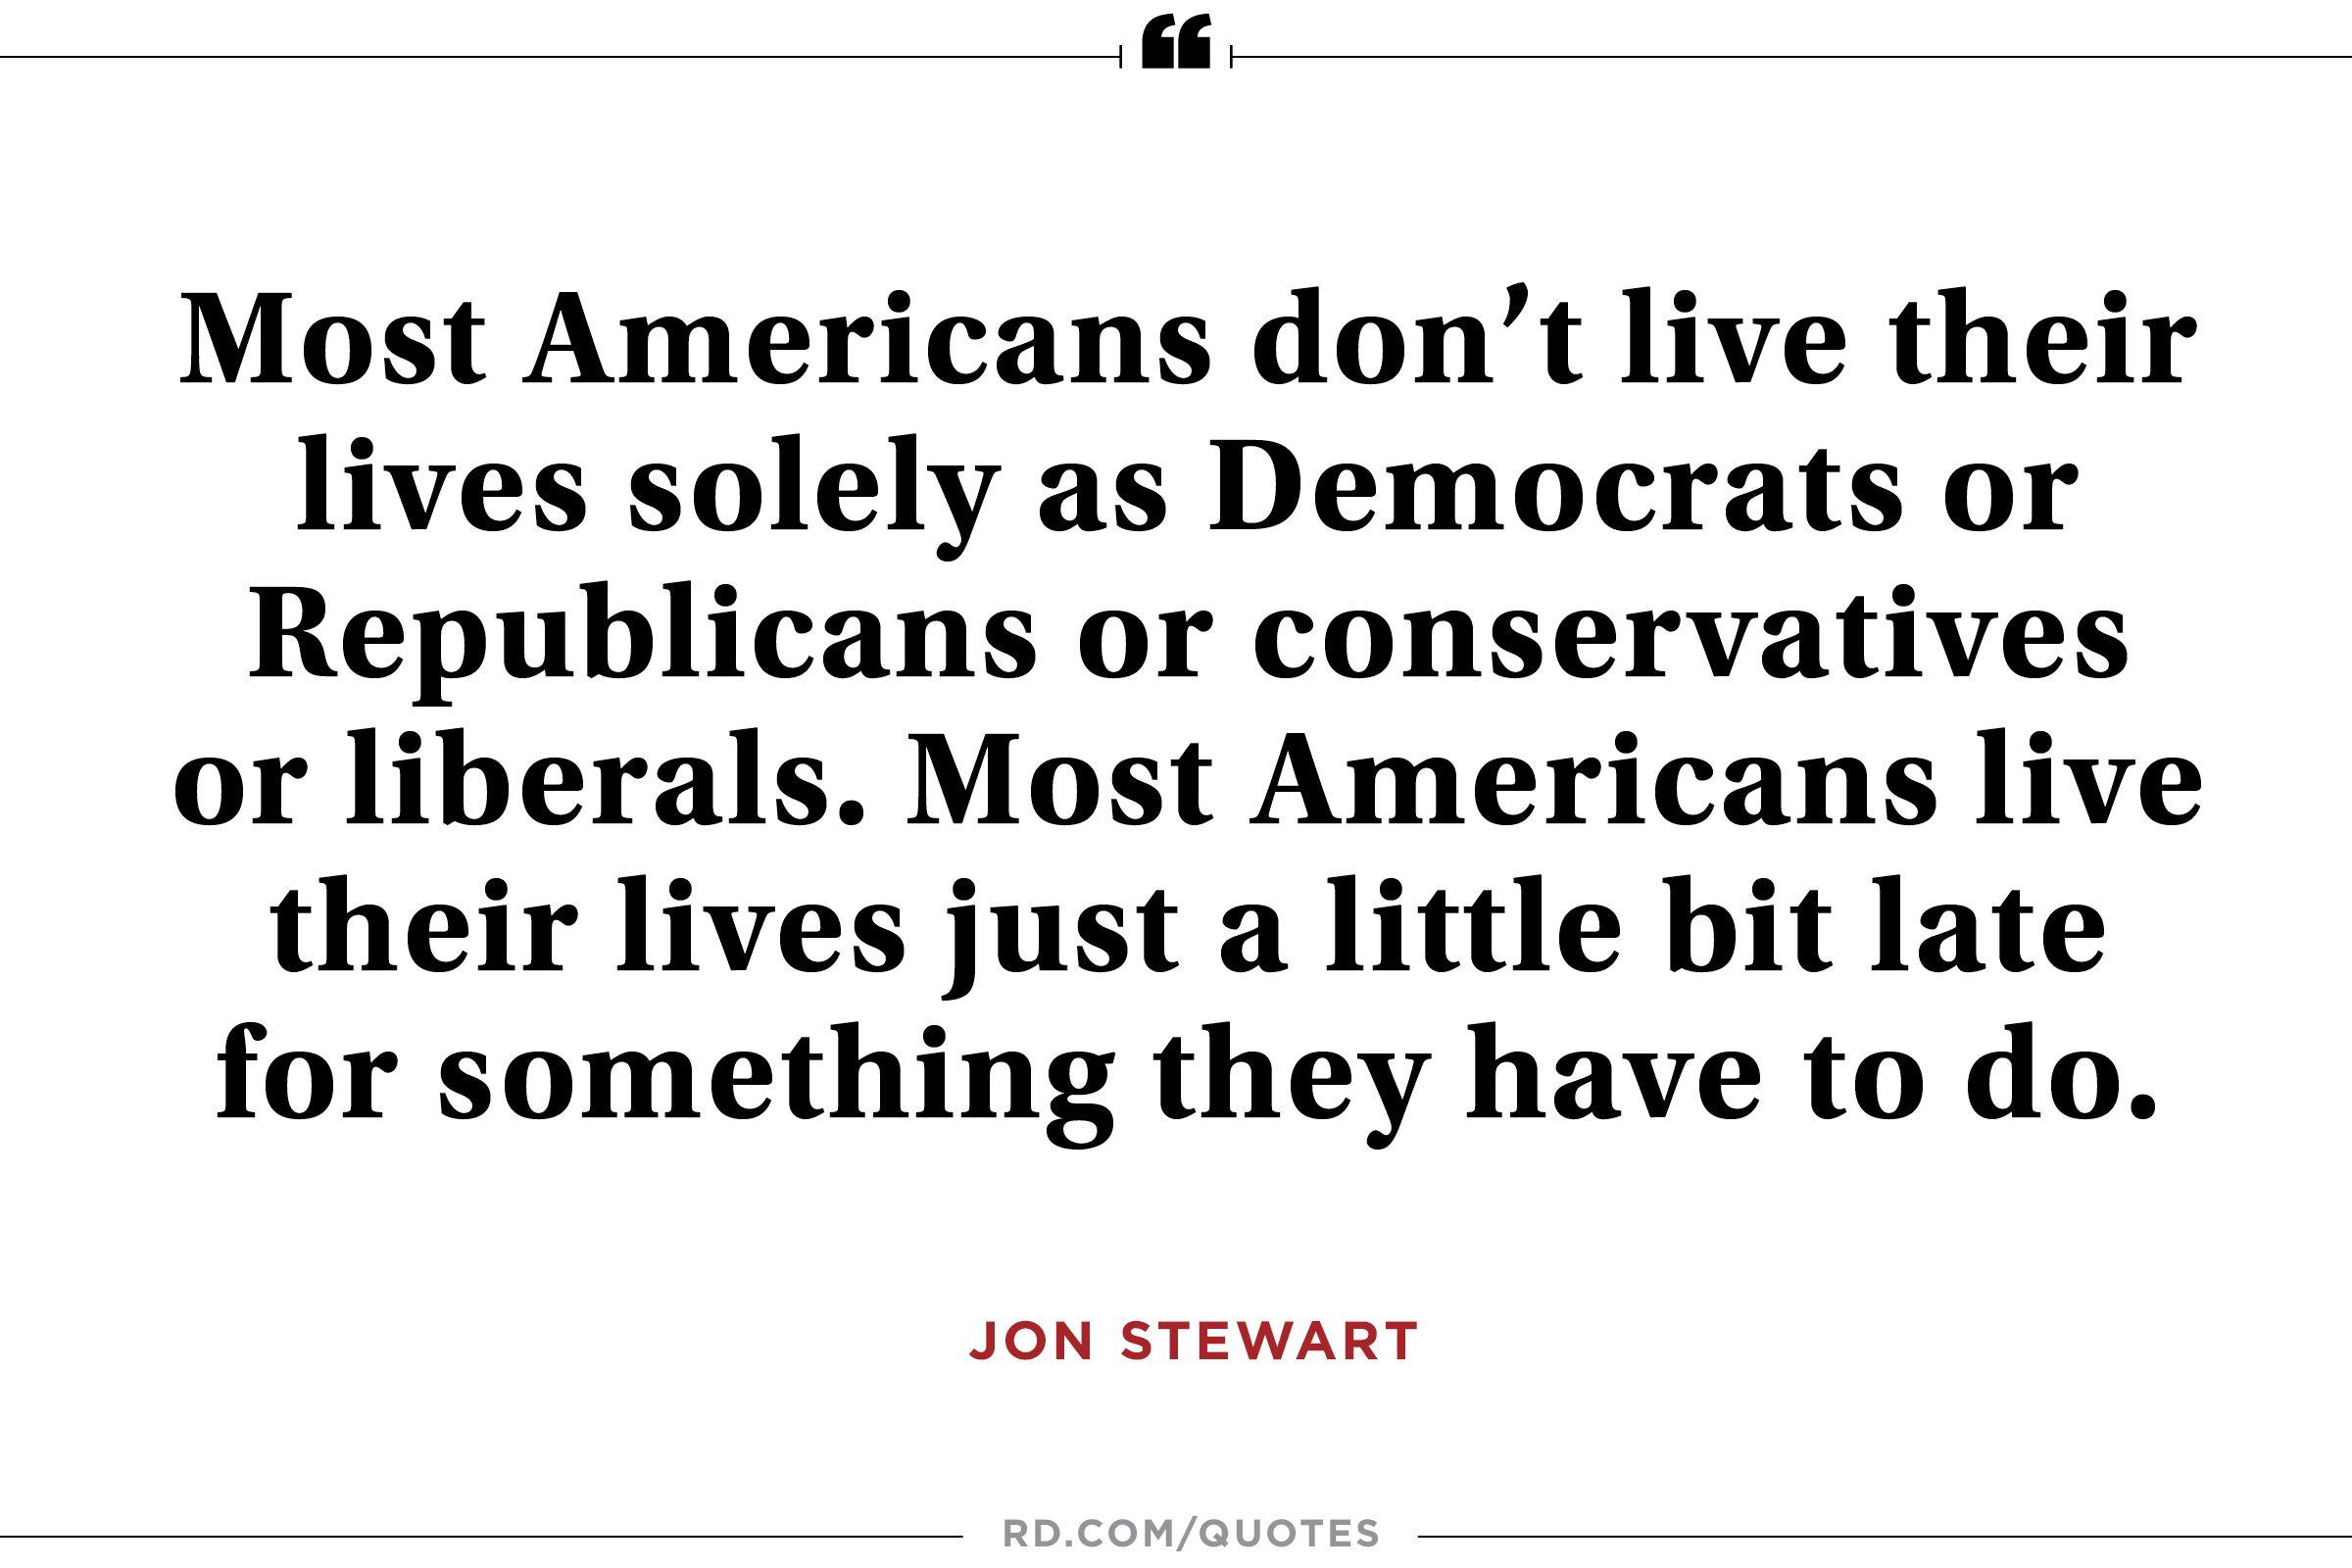 Jon Stewart on the What Unites Us